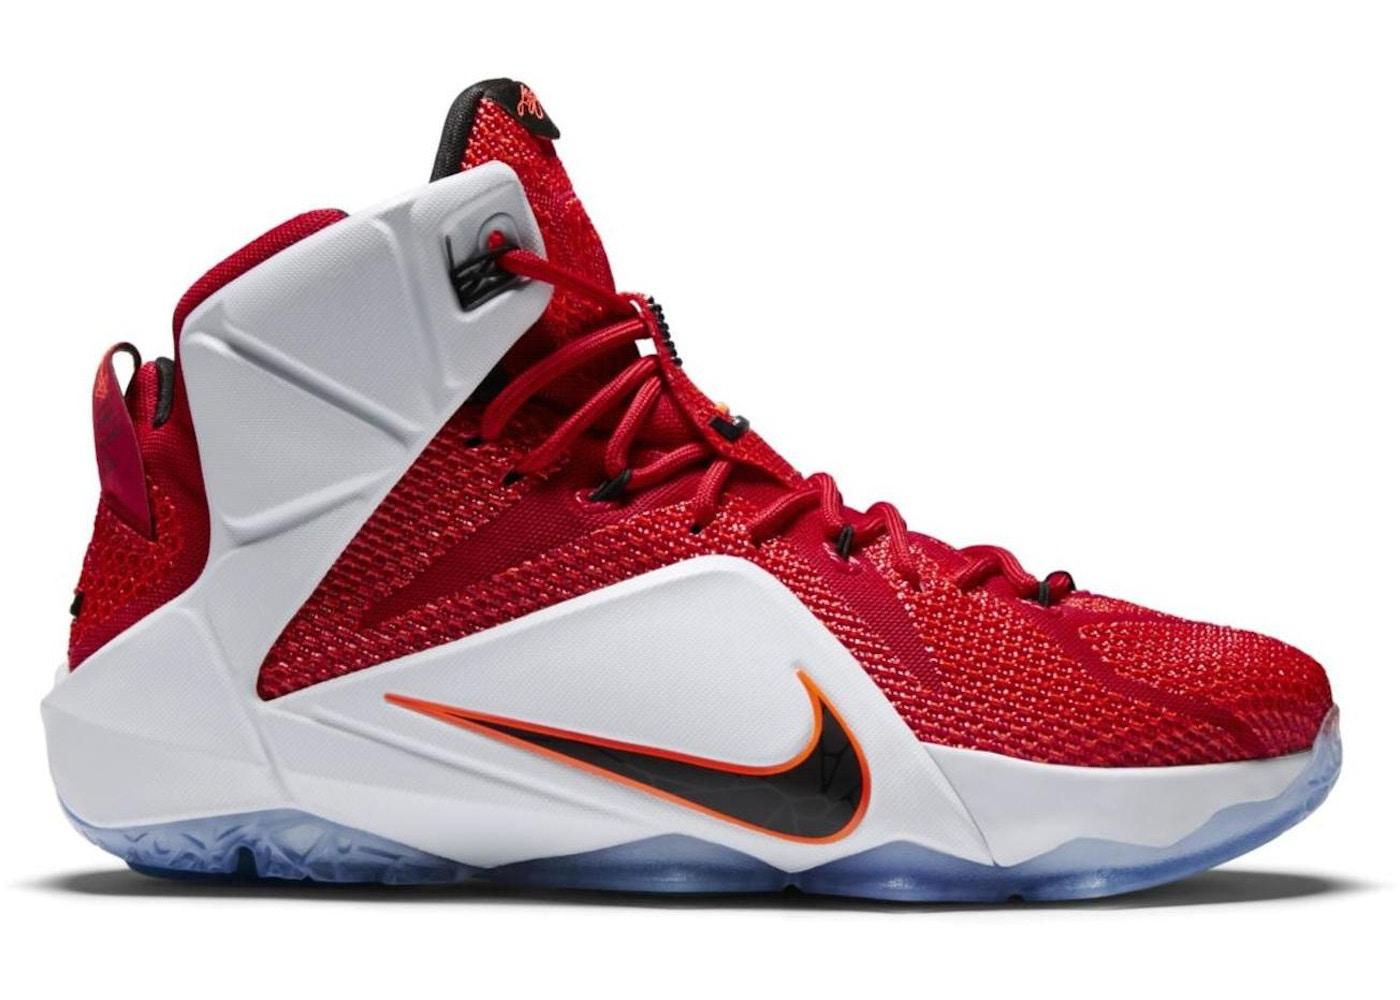 buy popular 211a2 9b7a7 Buy Nike LeBron 12 Shoes   Deadstock Sneakers